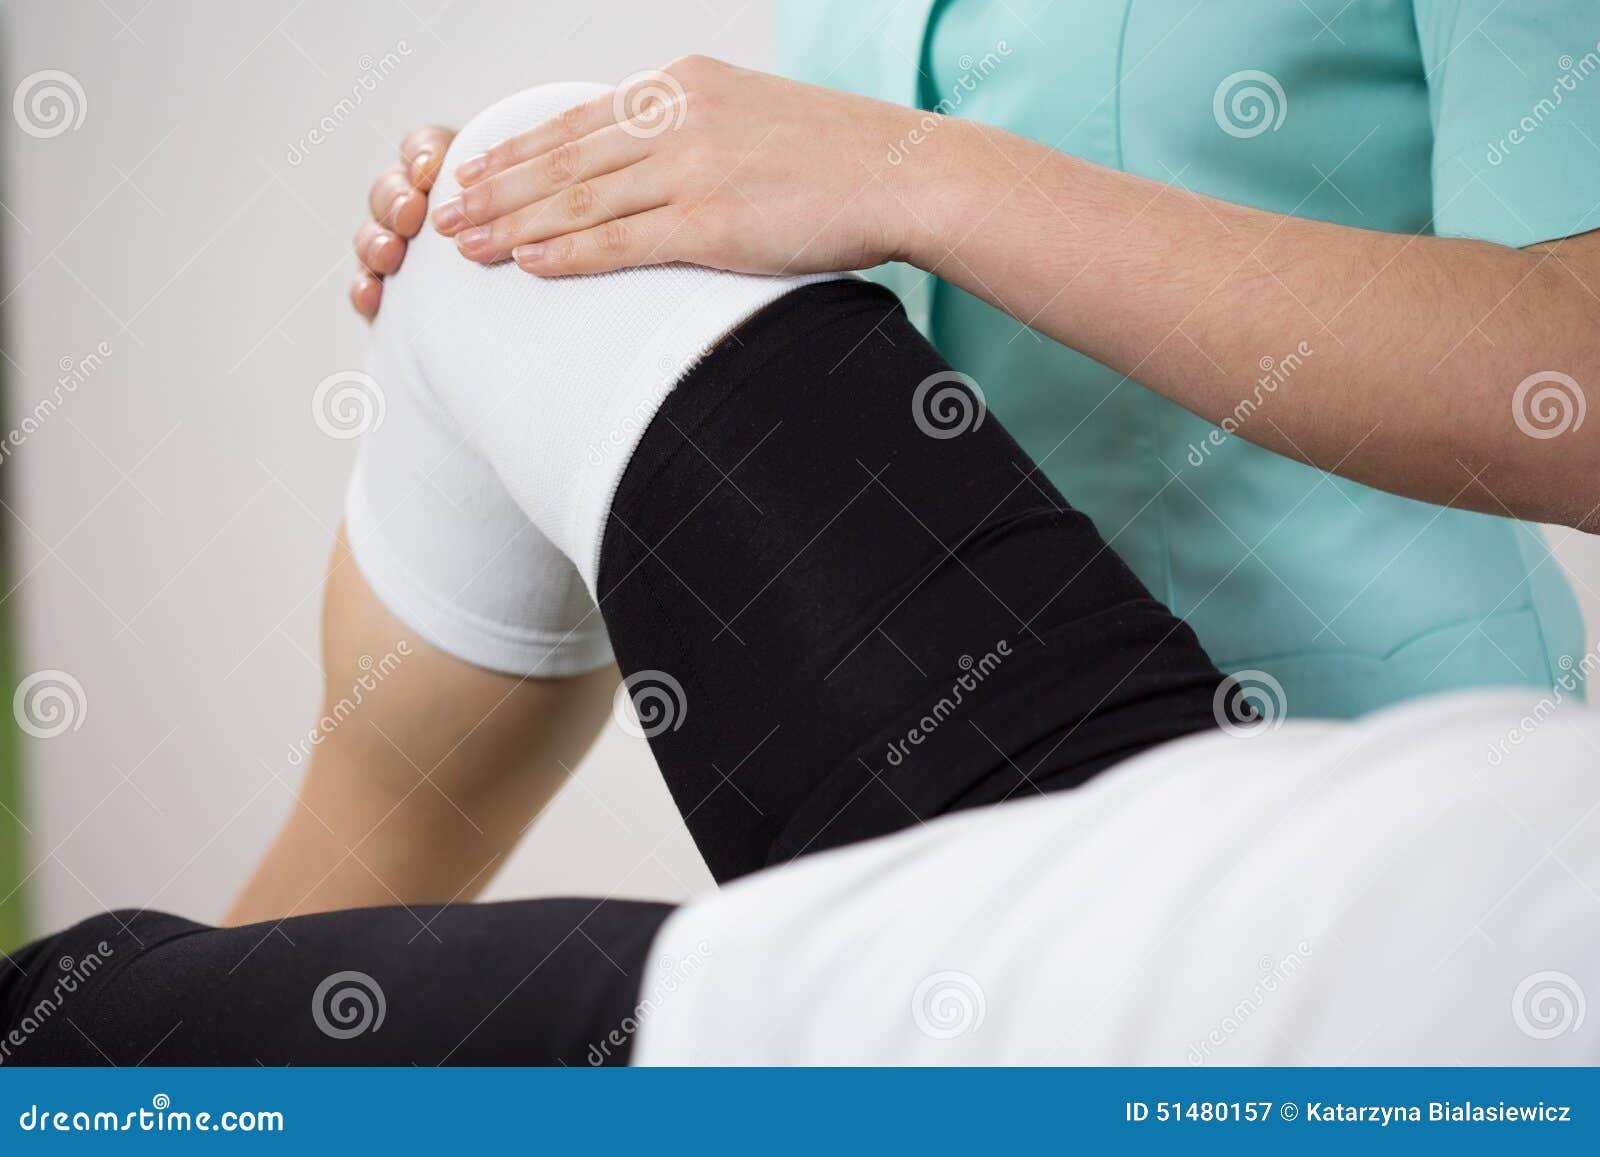 Orthopedic diagnosing painful knee